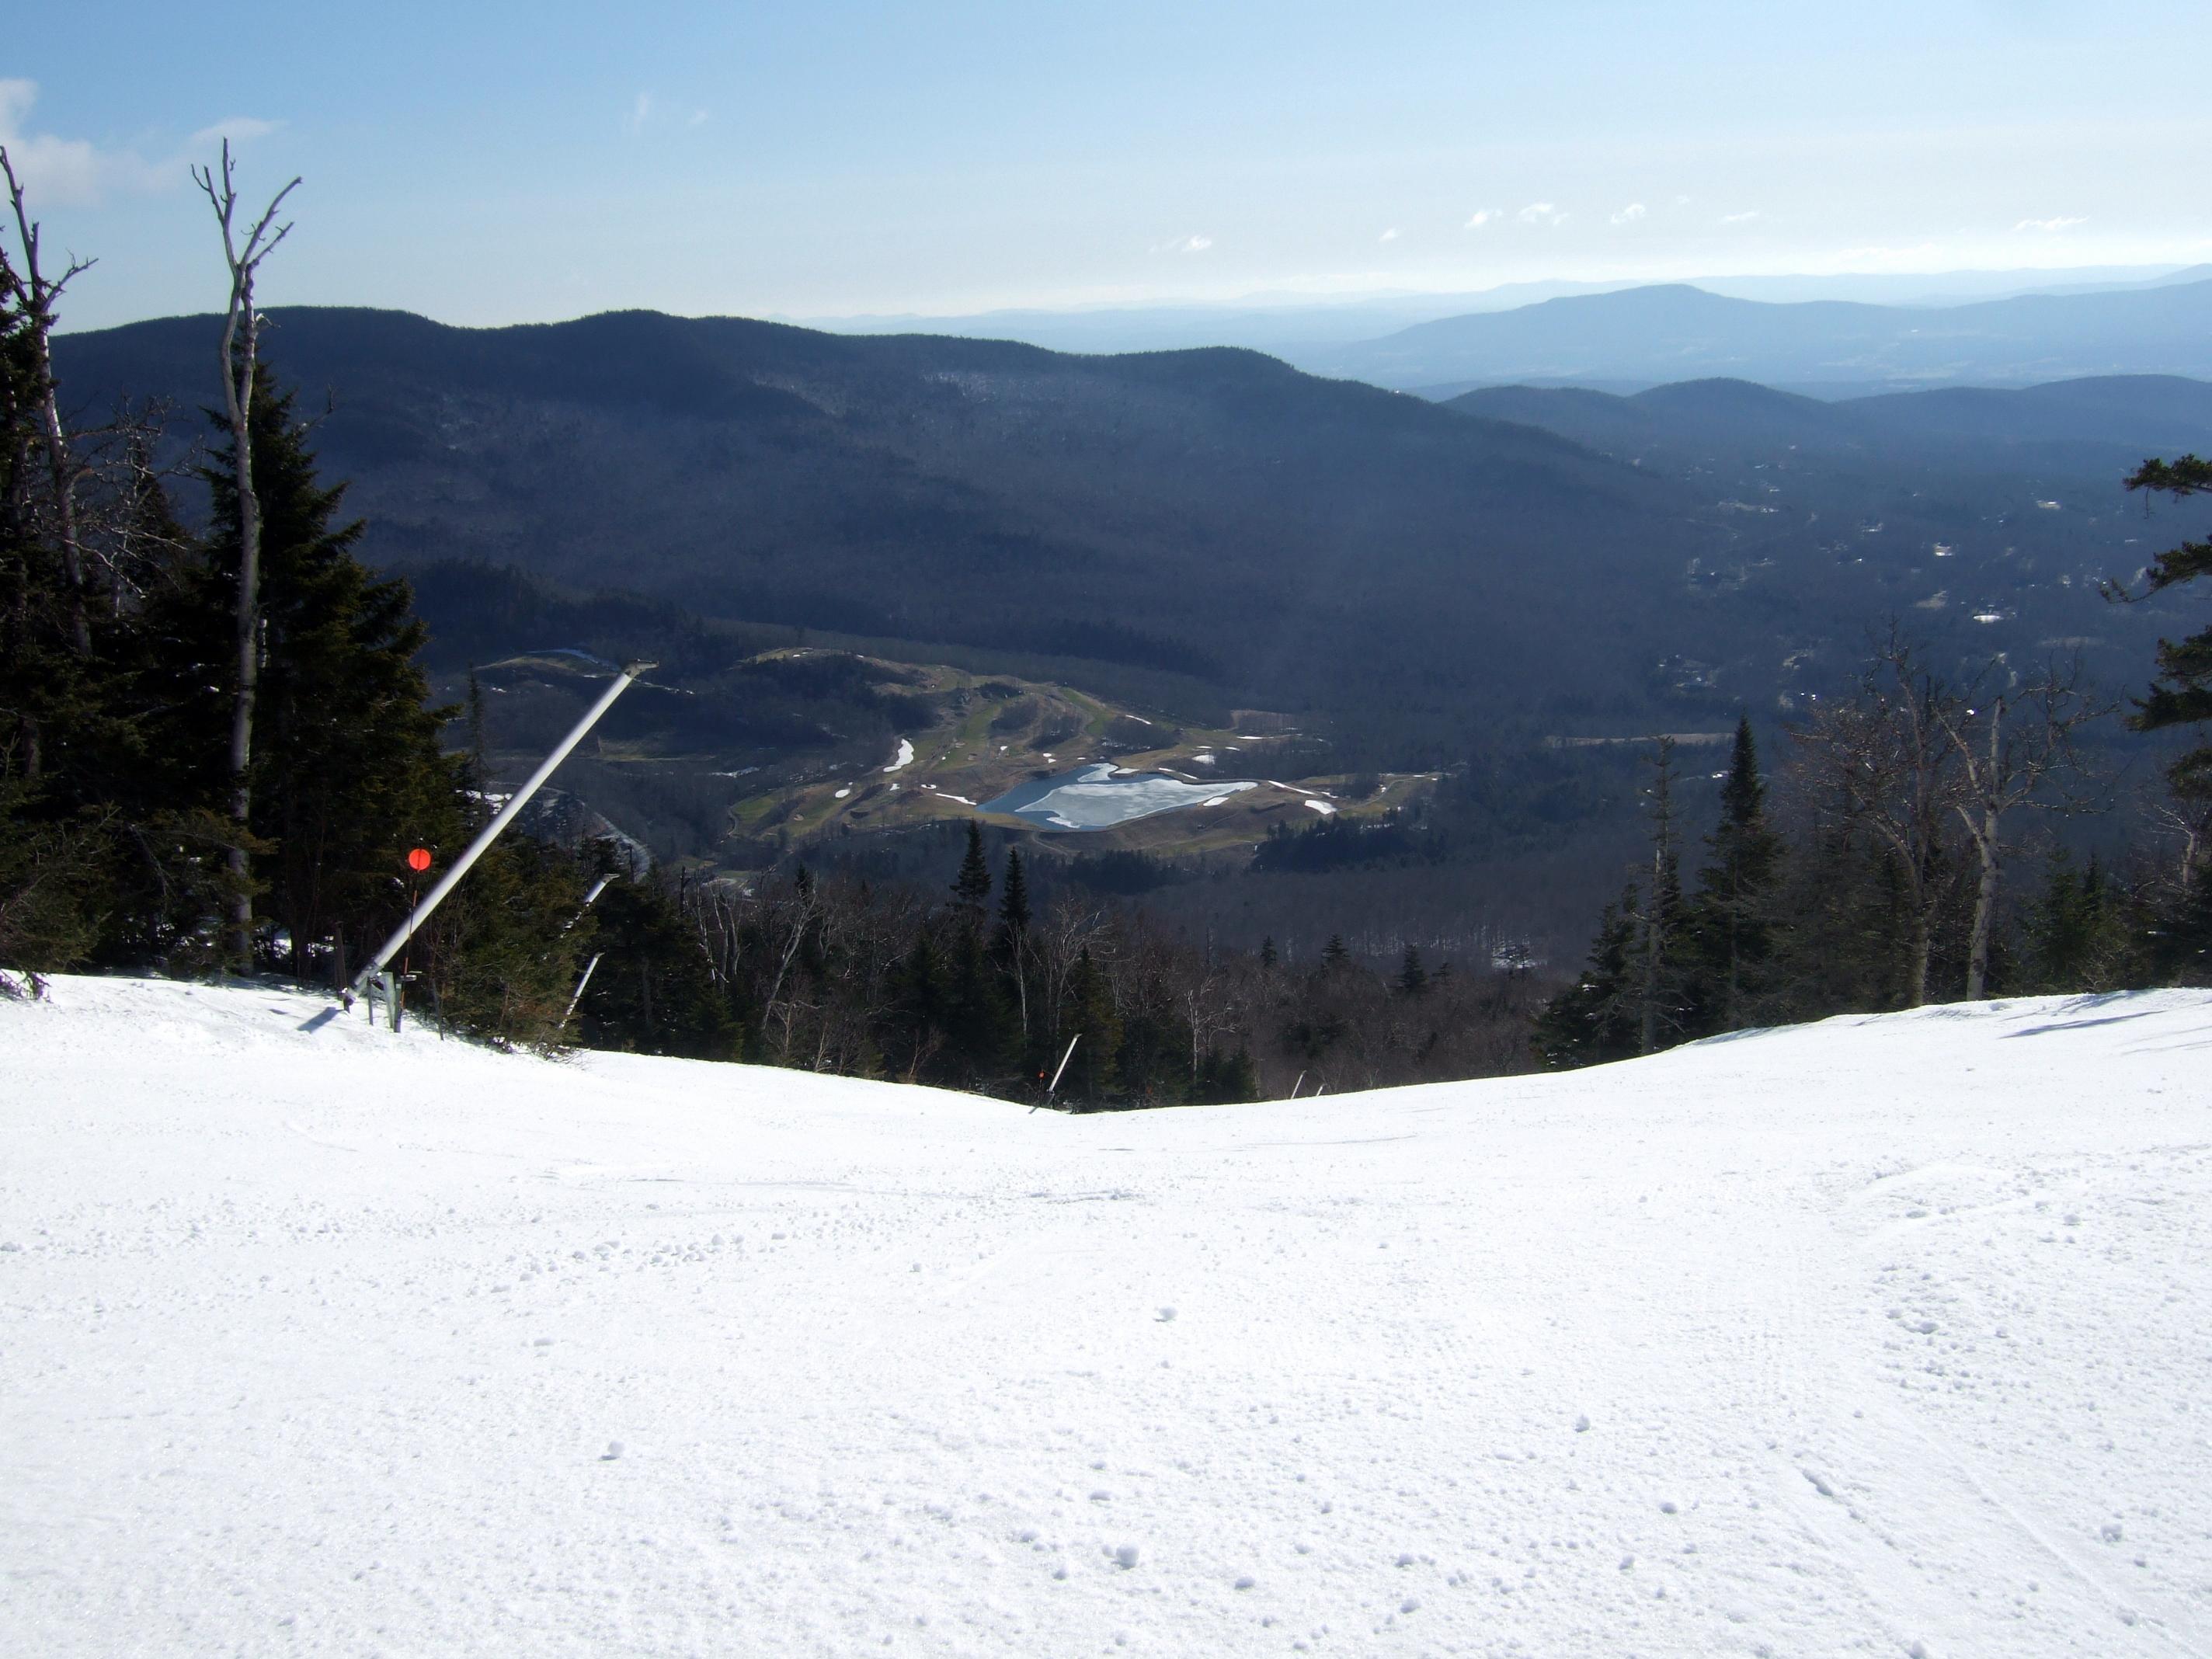 stowe mountain resort - stowe vt - living new deal